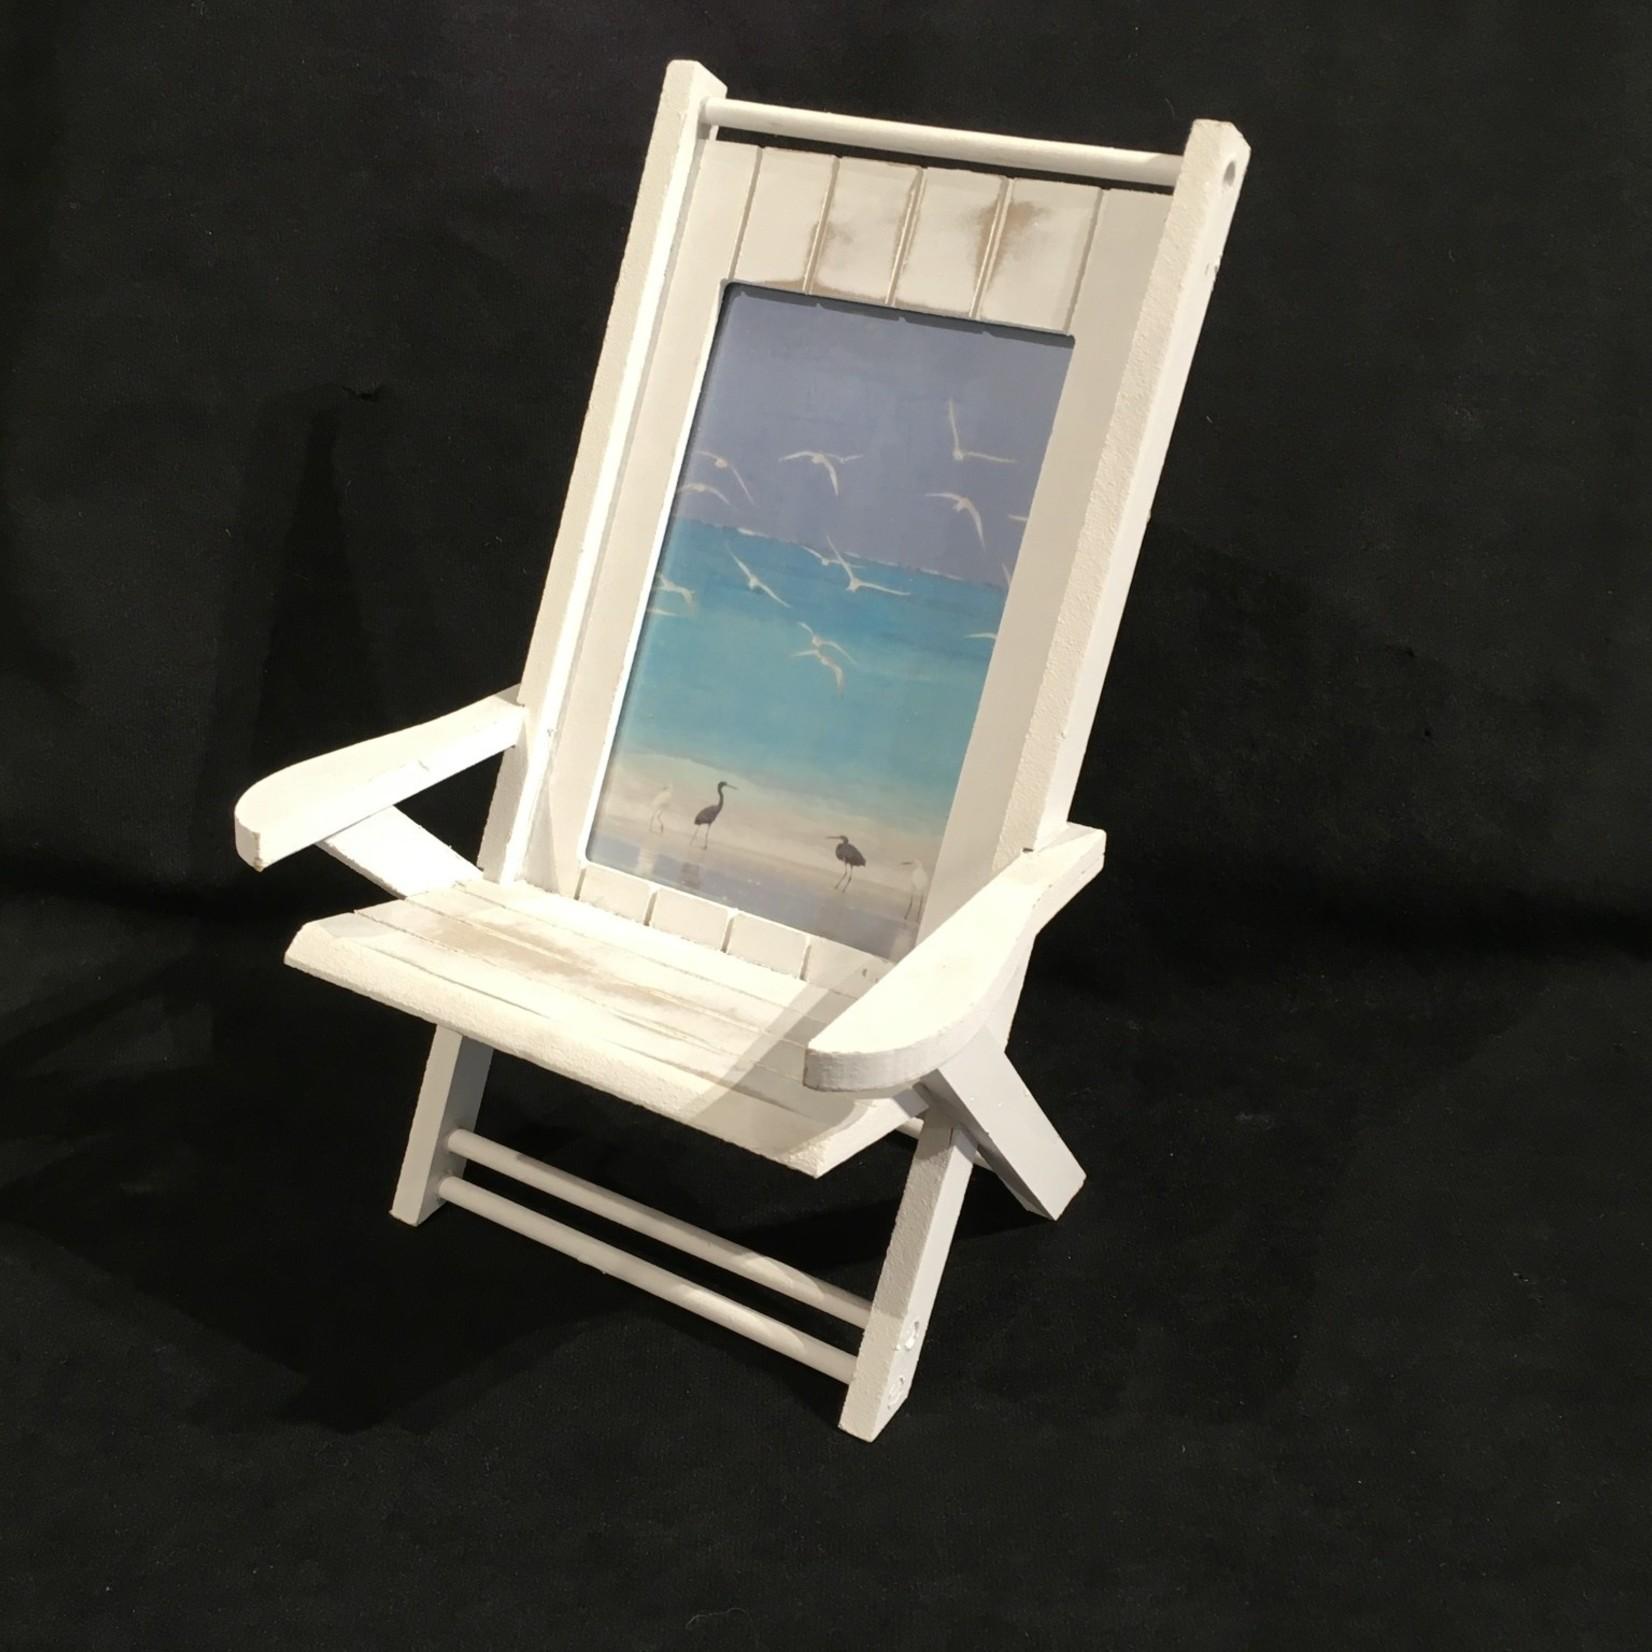 "Muskoka Chair Photo Frame - 3.5x5.5"" photo"